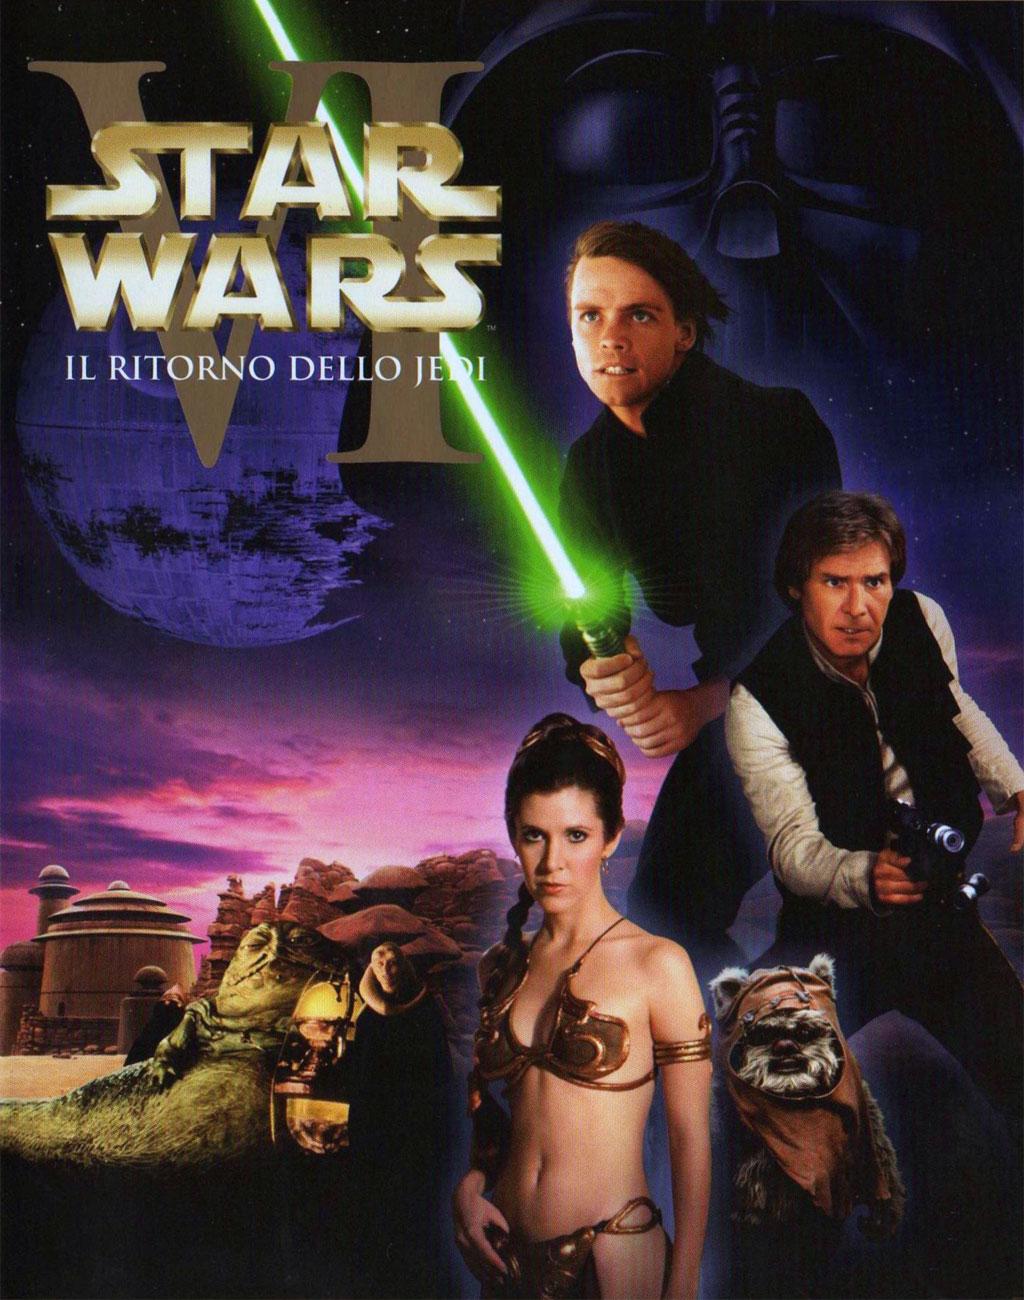 guerre stellari frasi famose